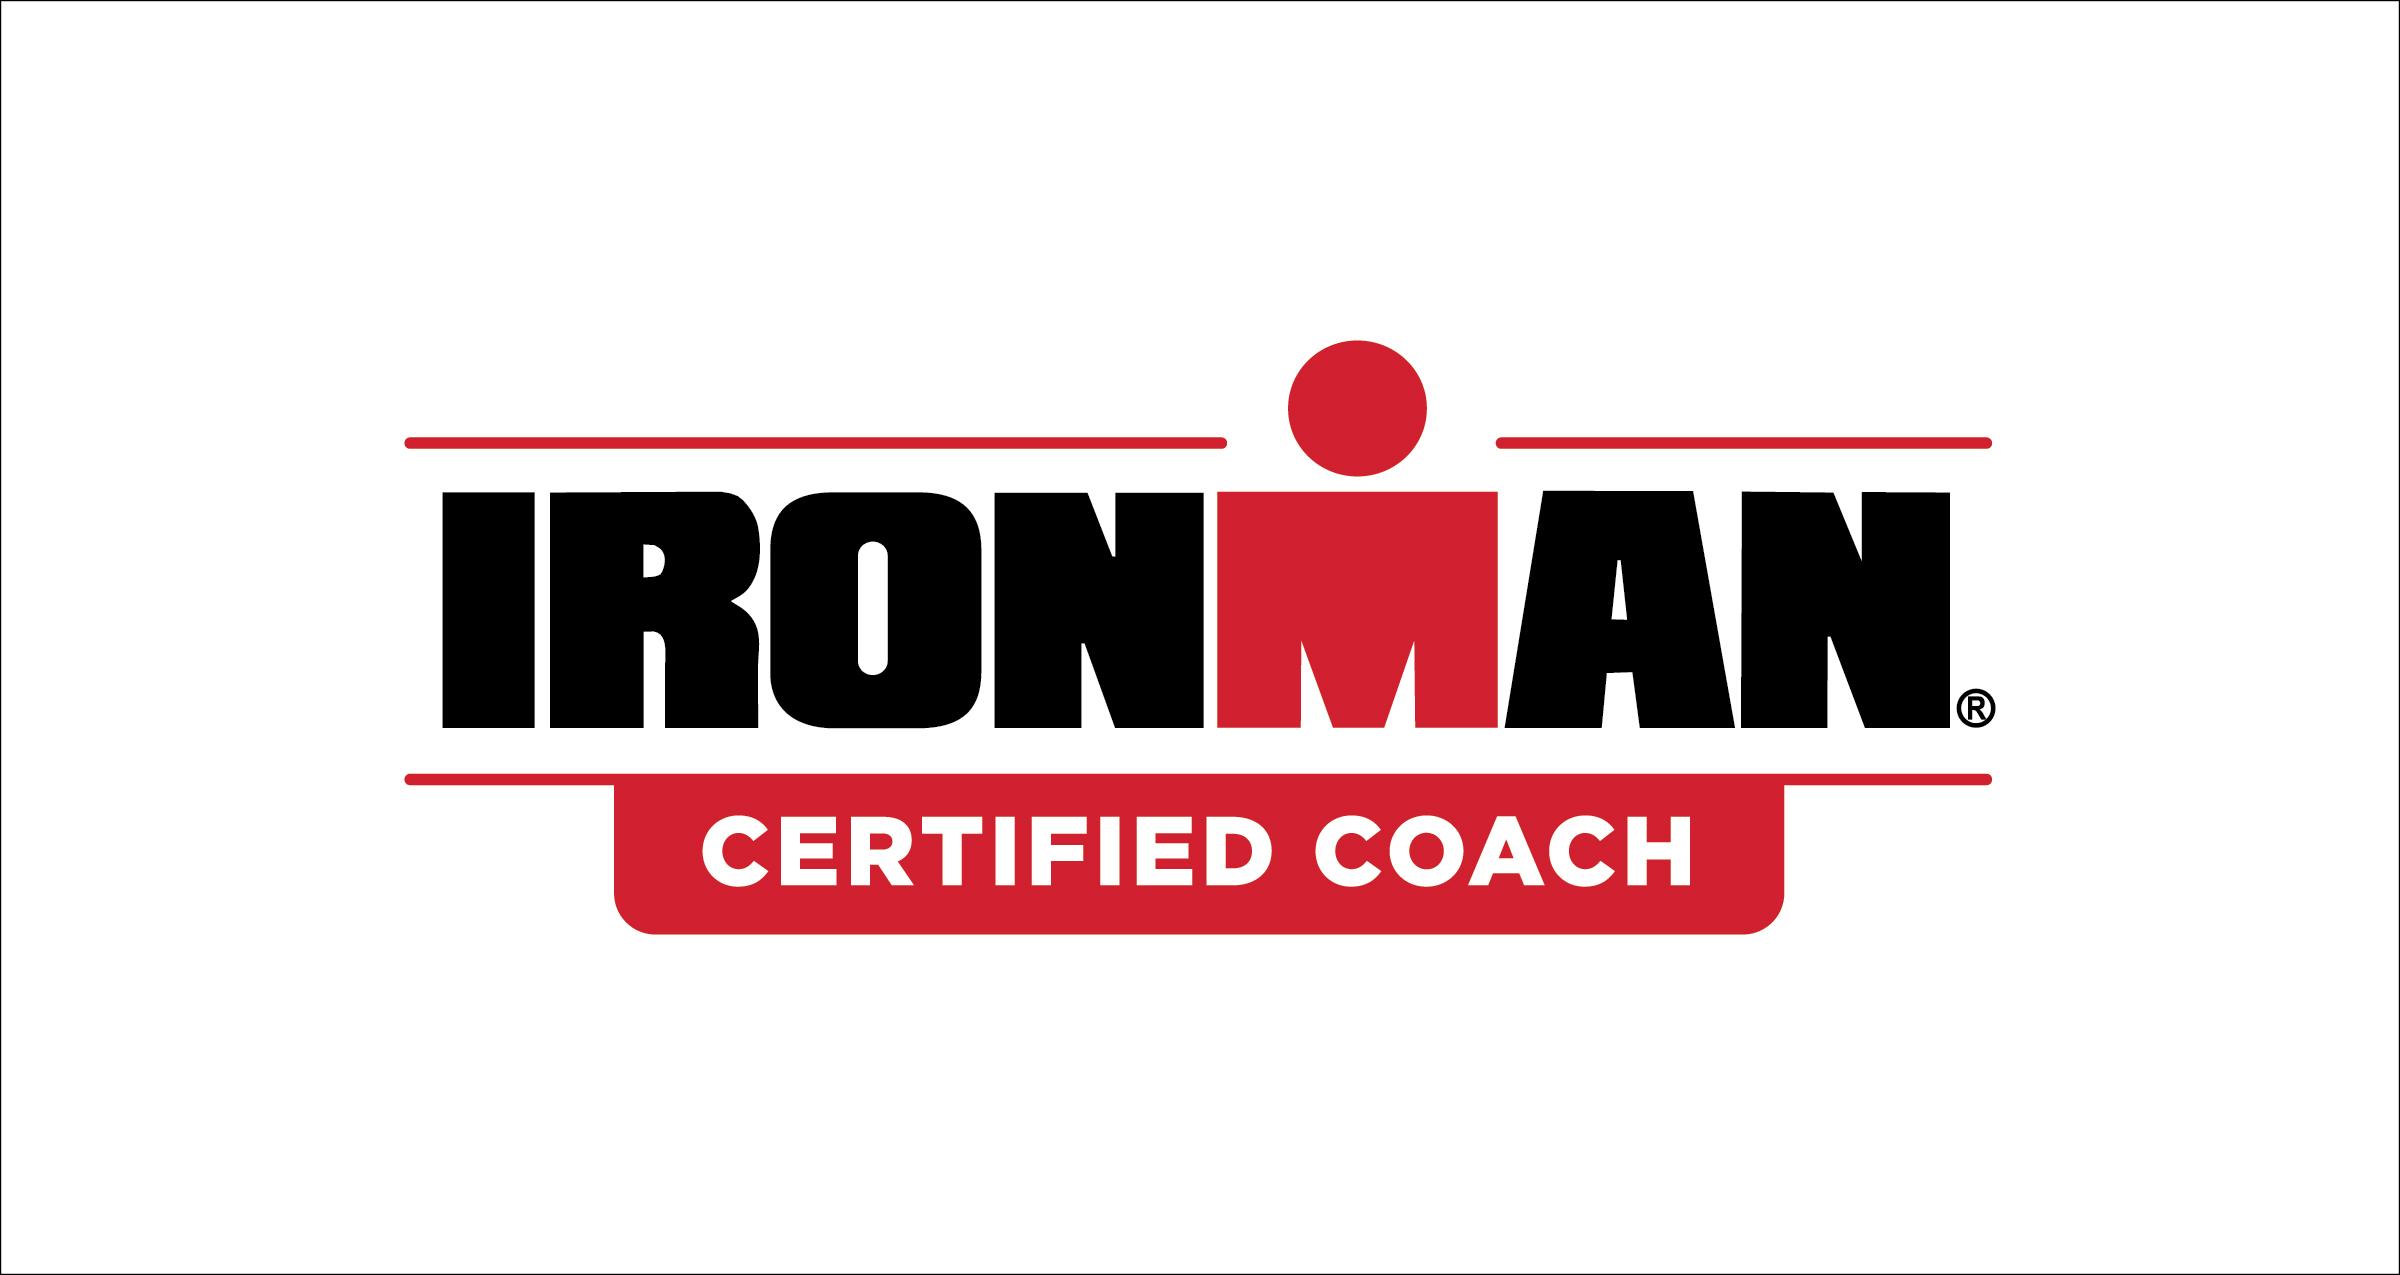 Ironman Triathlon Certified Coach